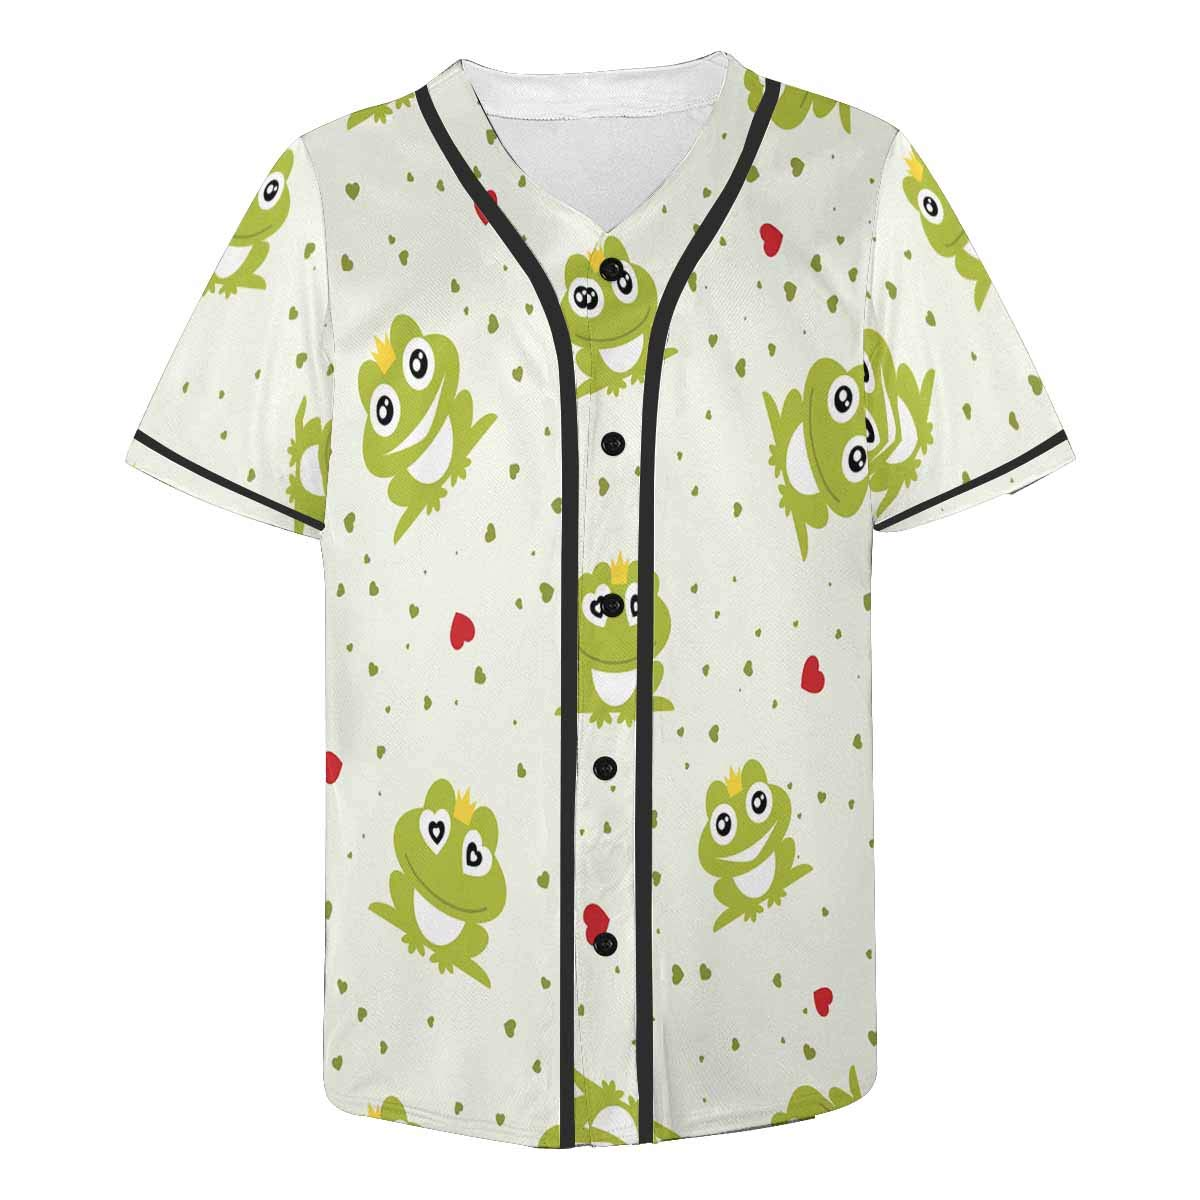 INTERESTPRINT Mens Fashion Baseball Jersey T-Shirt Frog with Crown